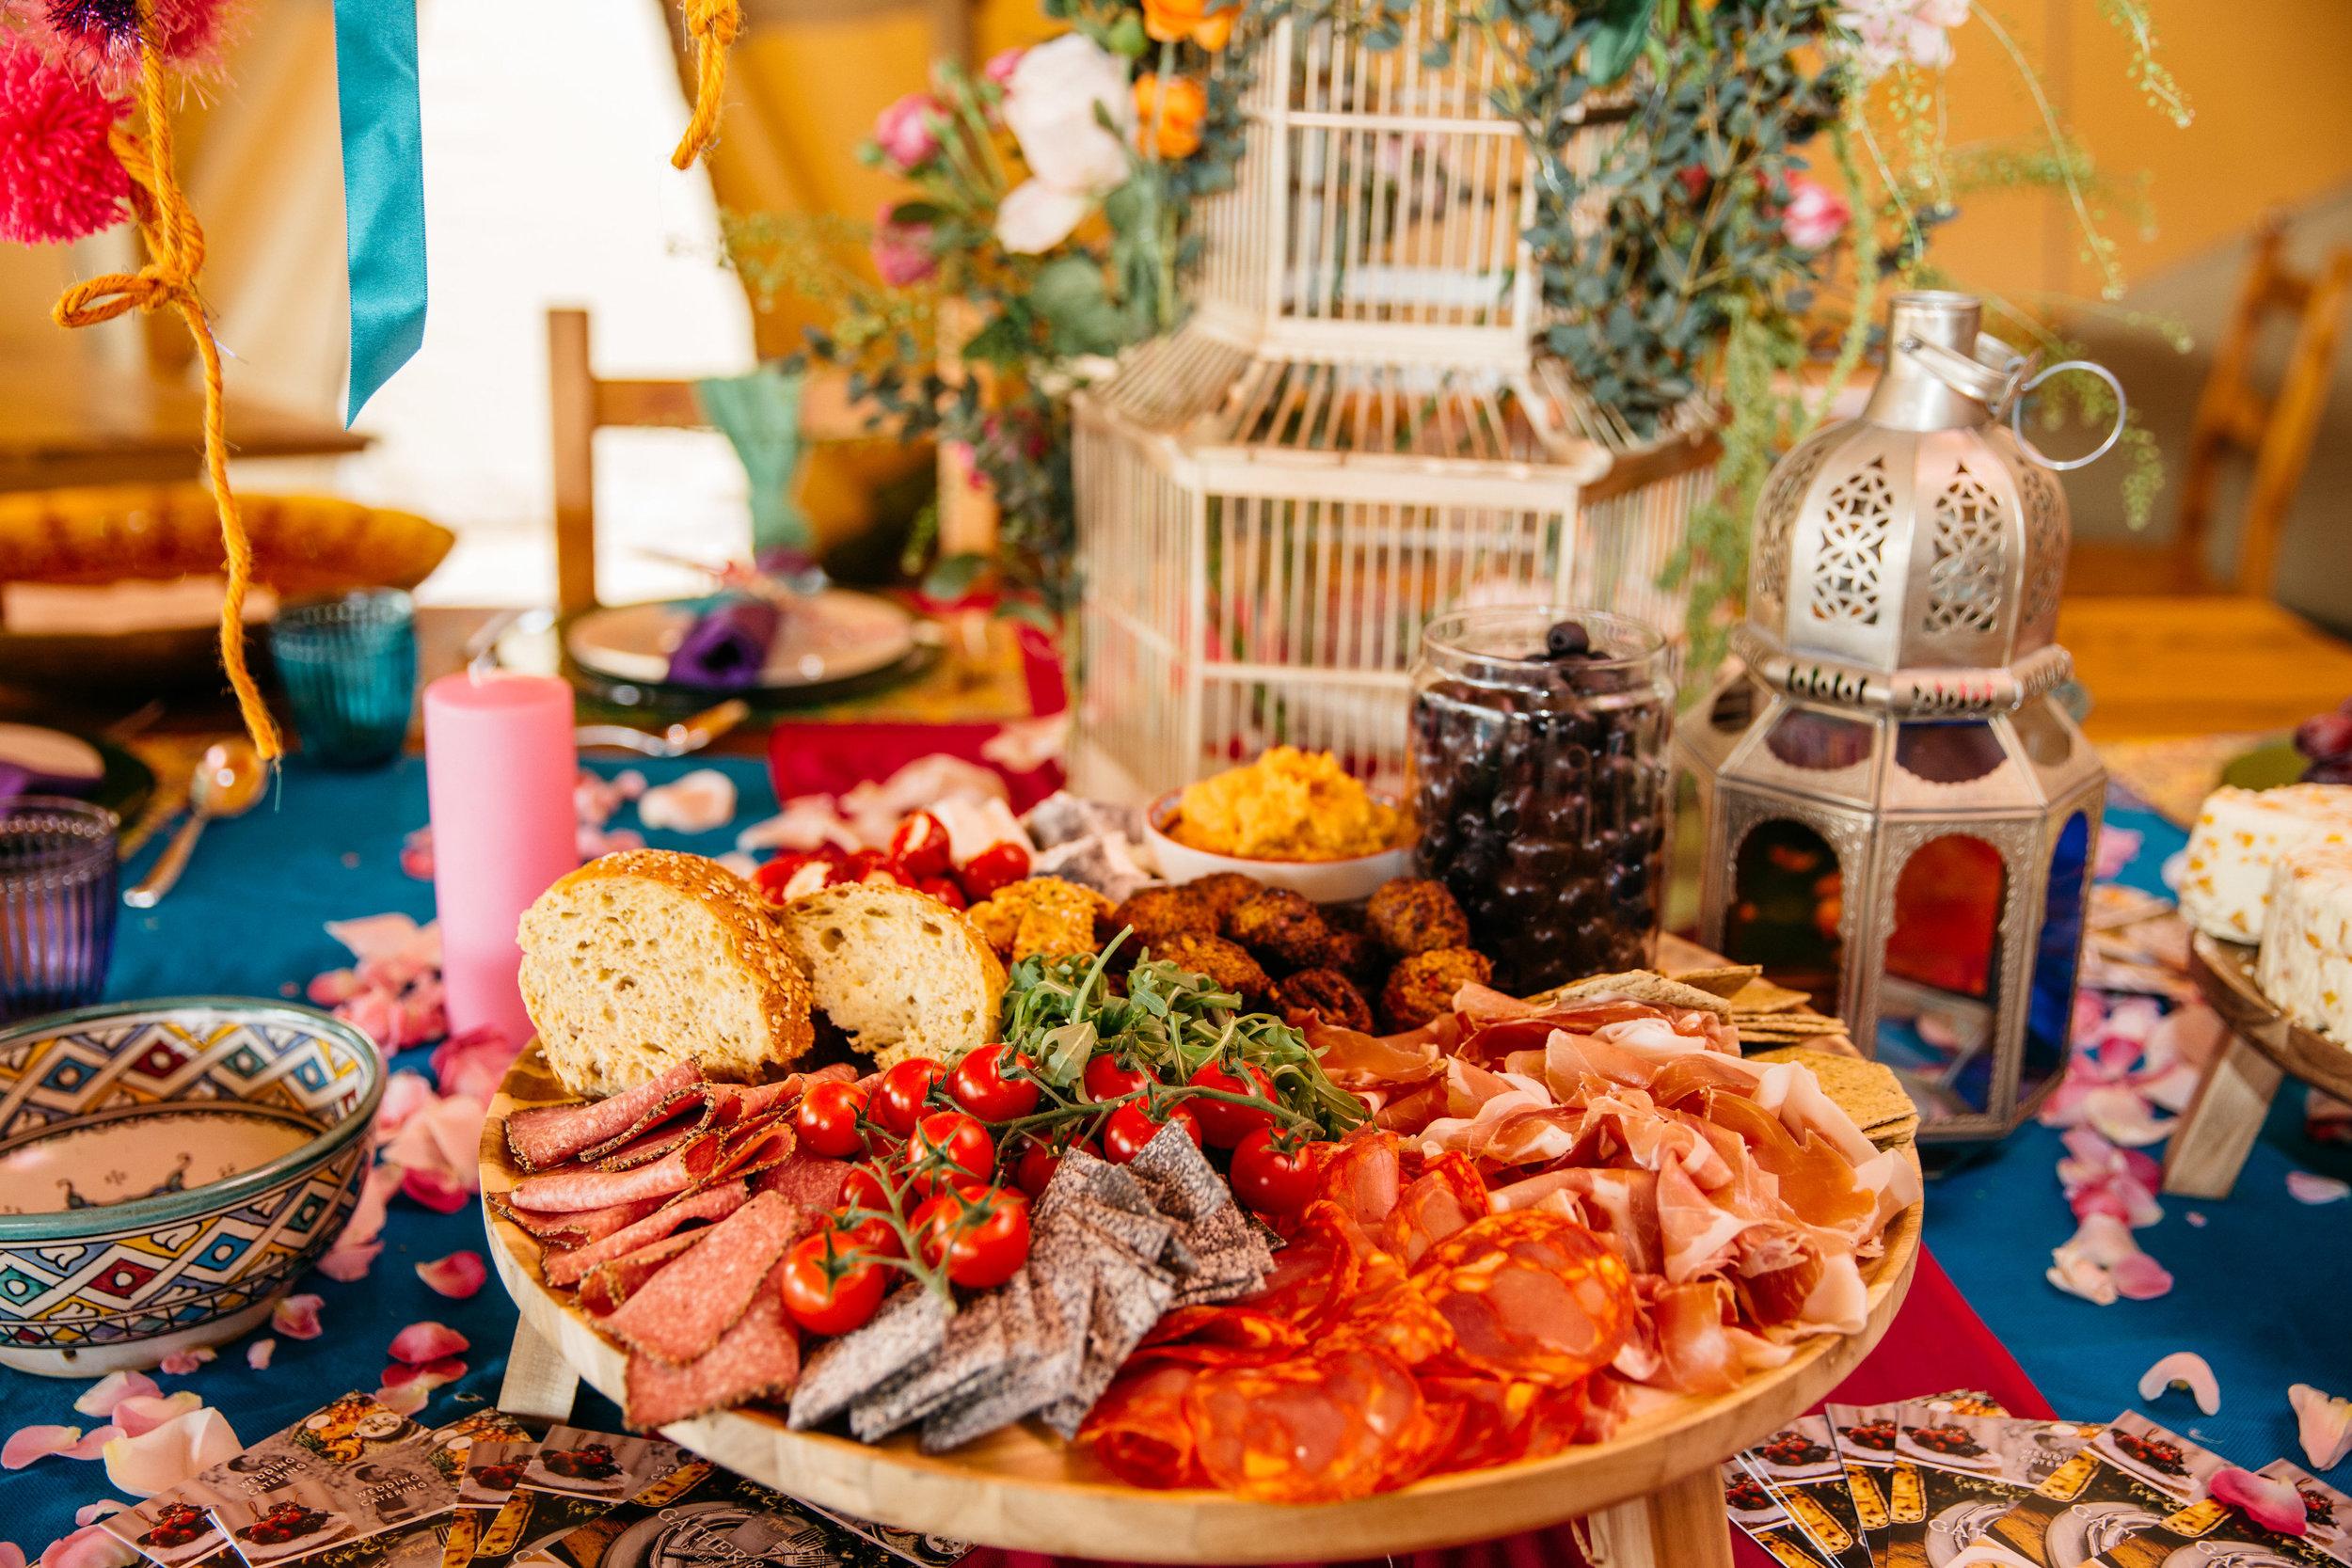 Alternative Wedding Food Ideas - Grazing Plates